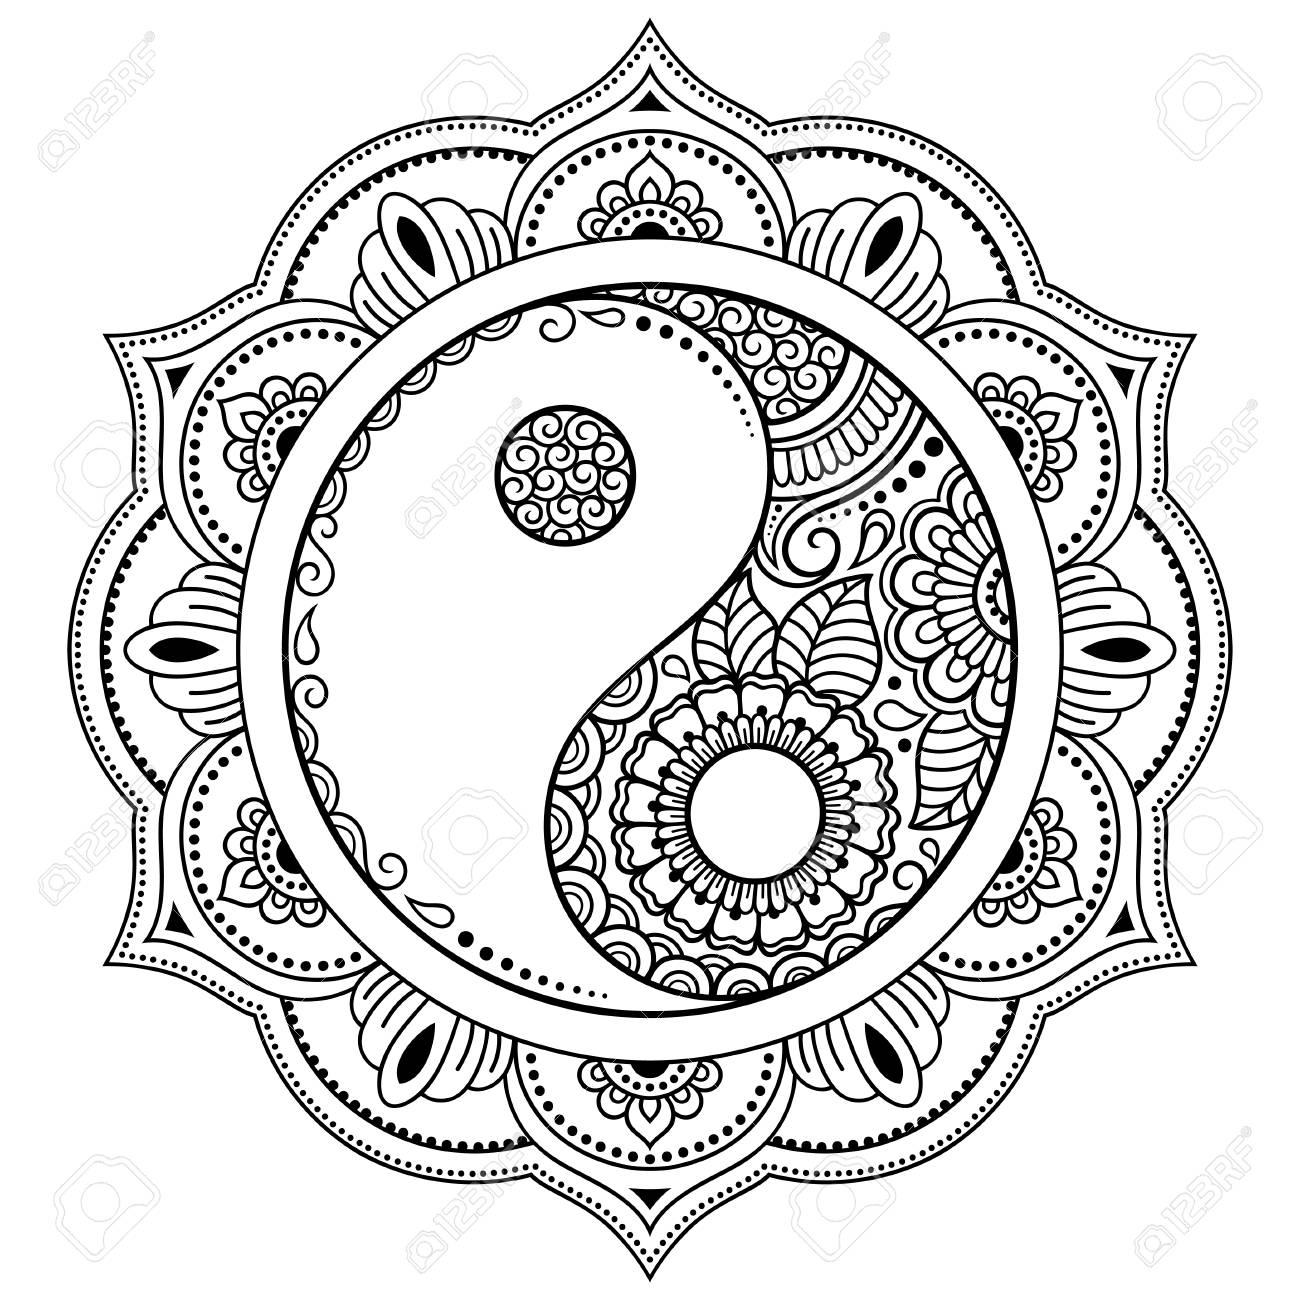 Circular Pattern In The Form Of A Mandala Yin Yang Decorative